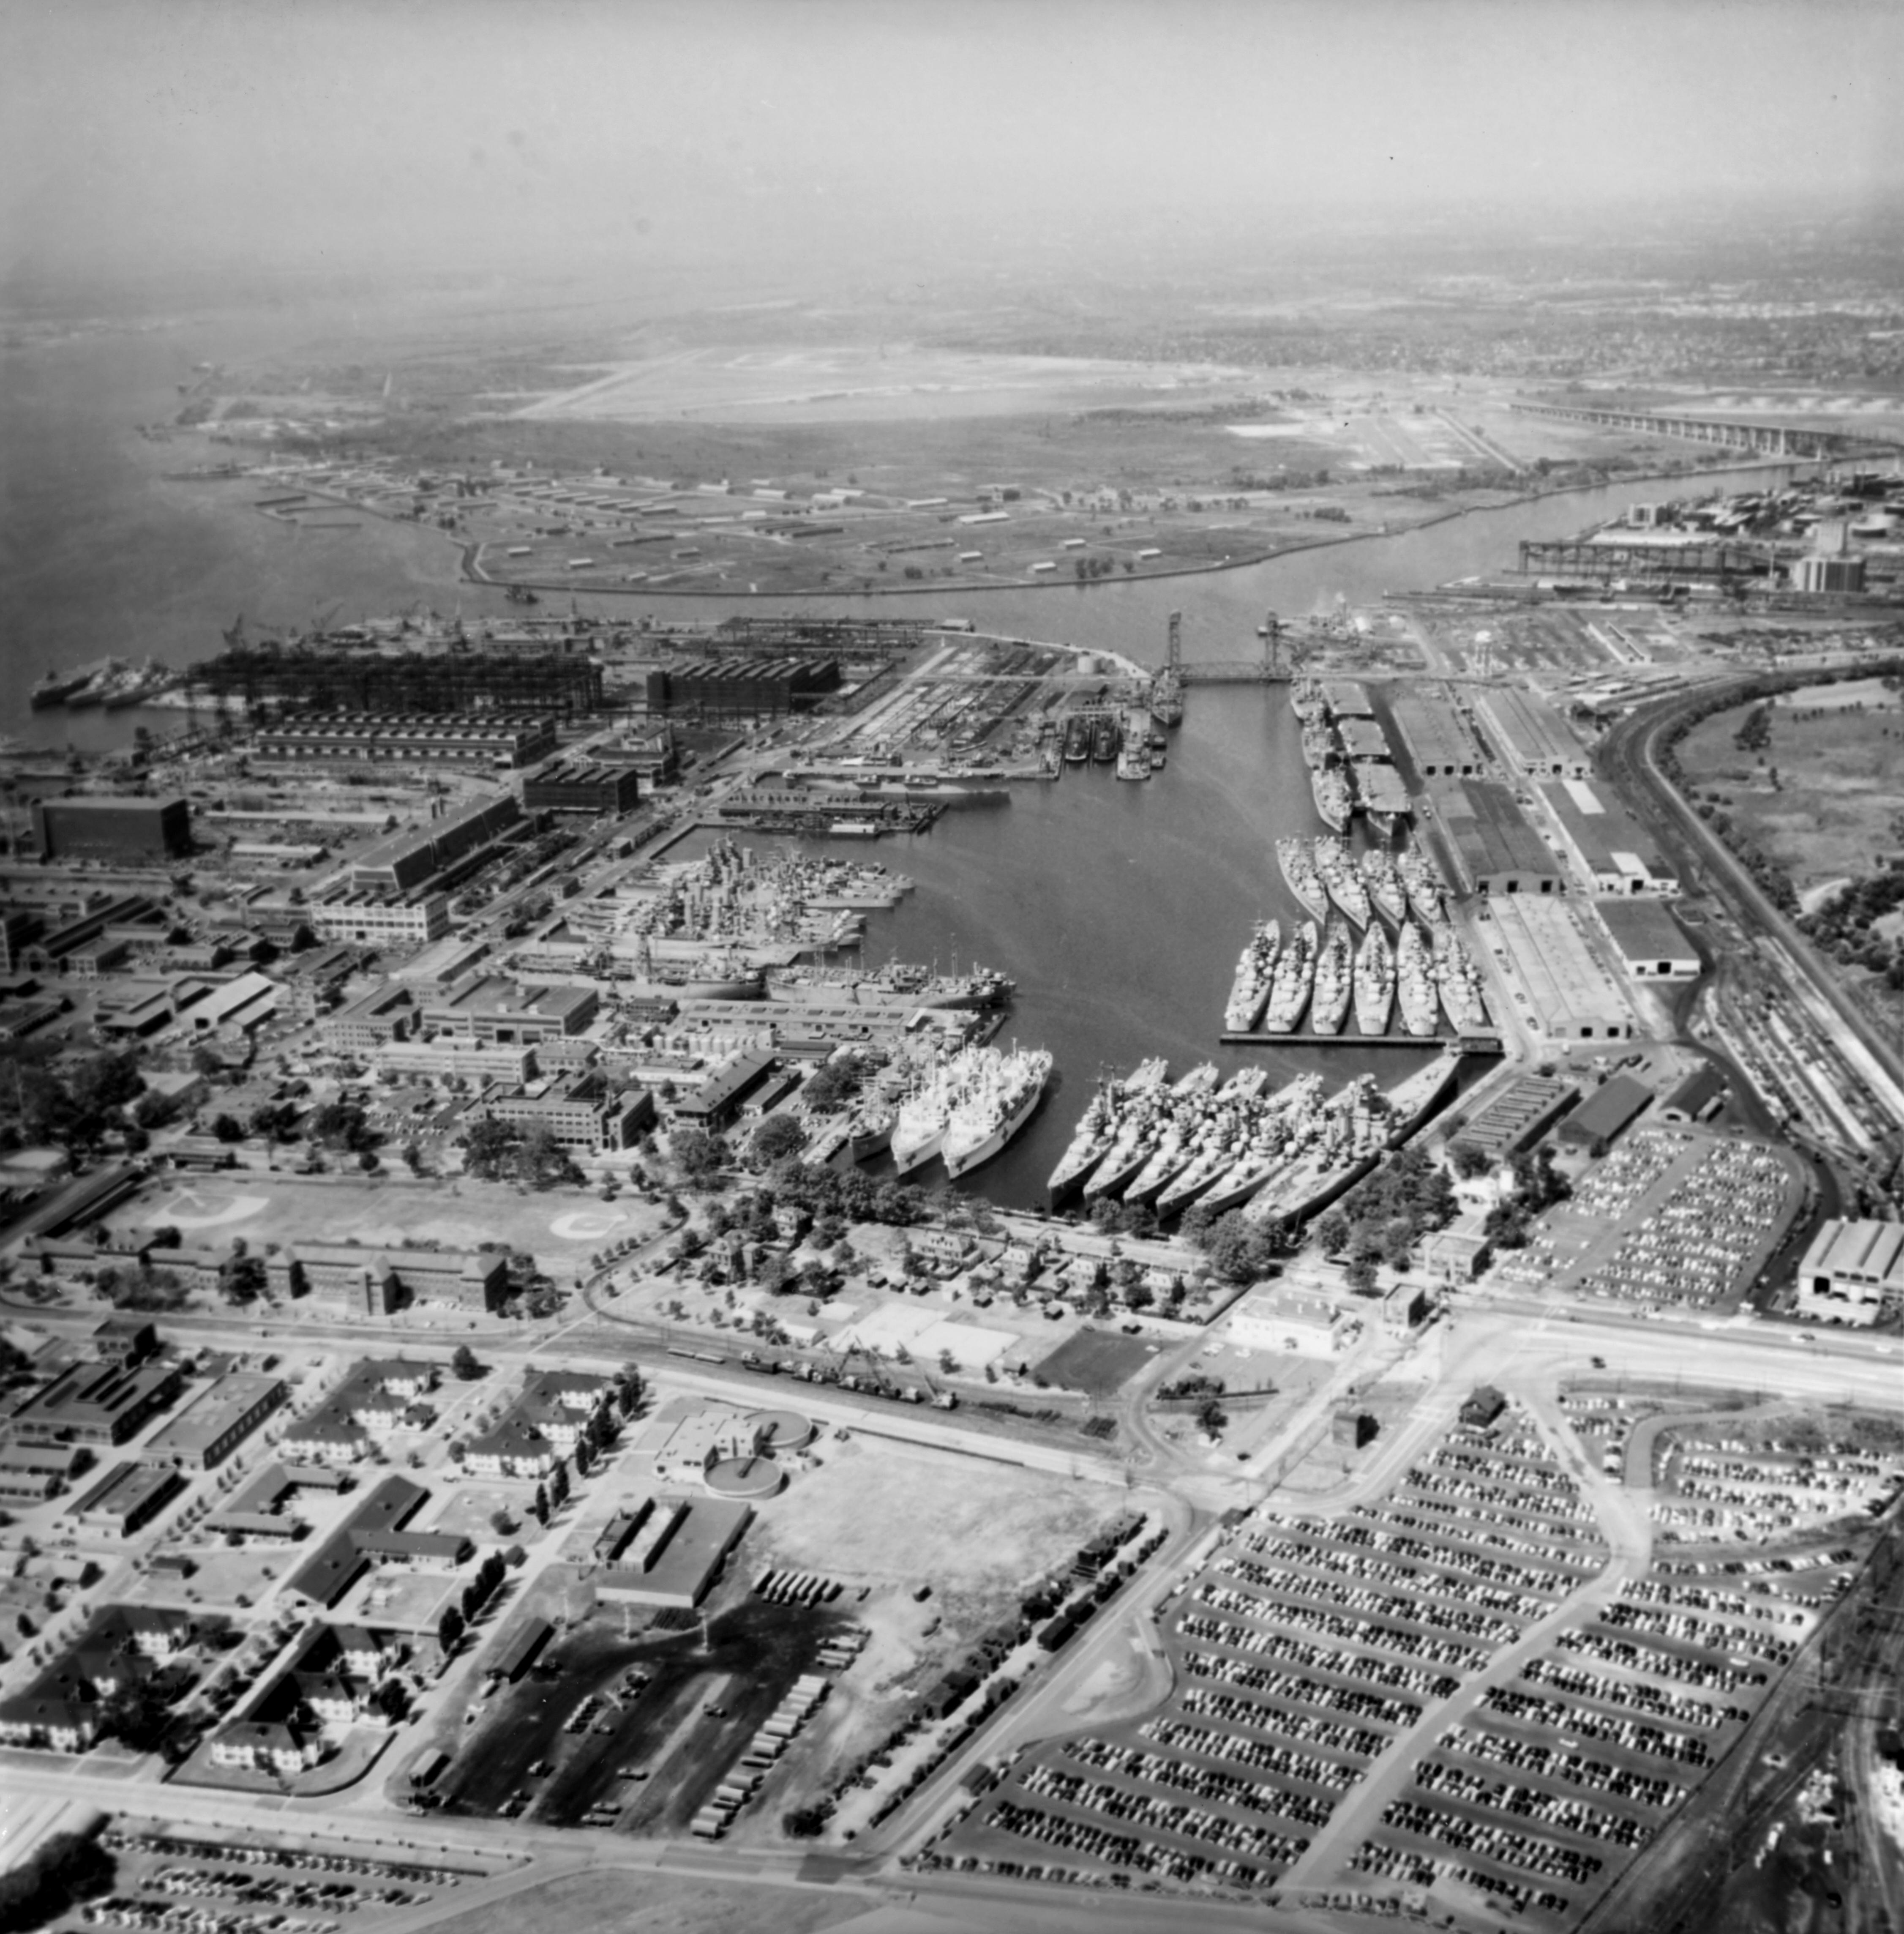 Reserve fleet - Wikipedia